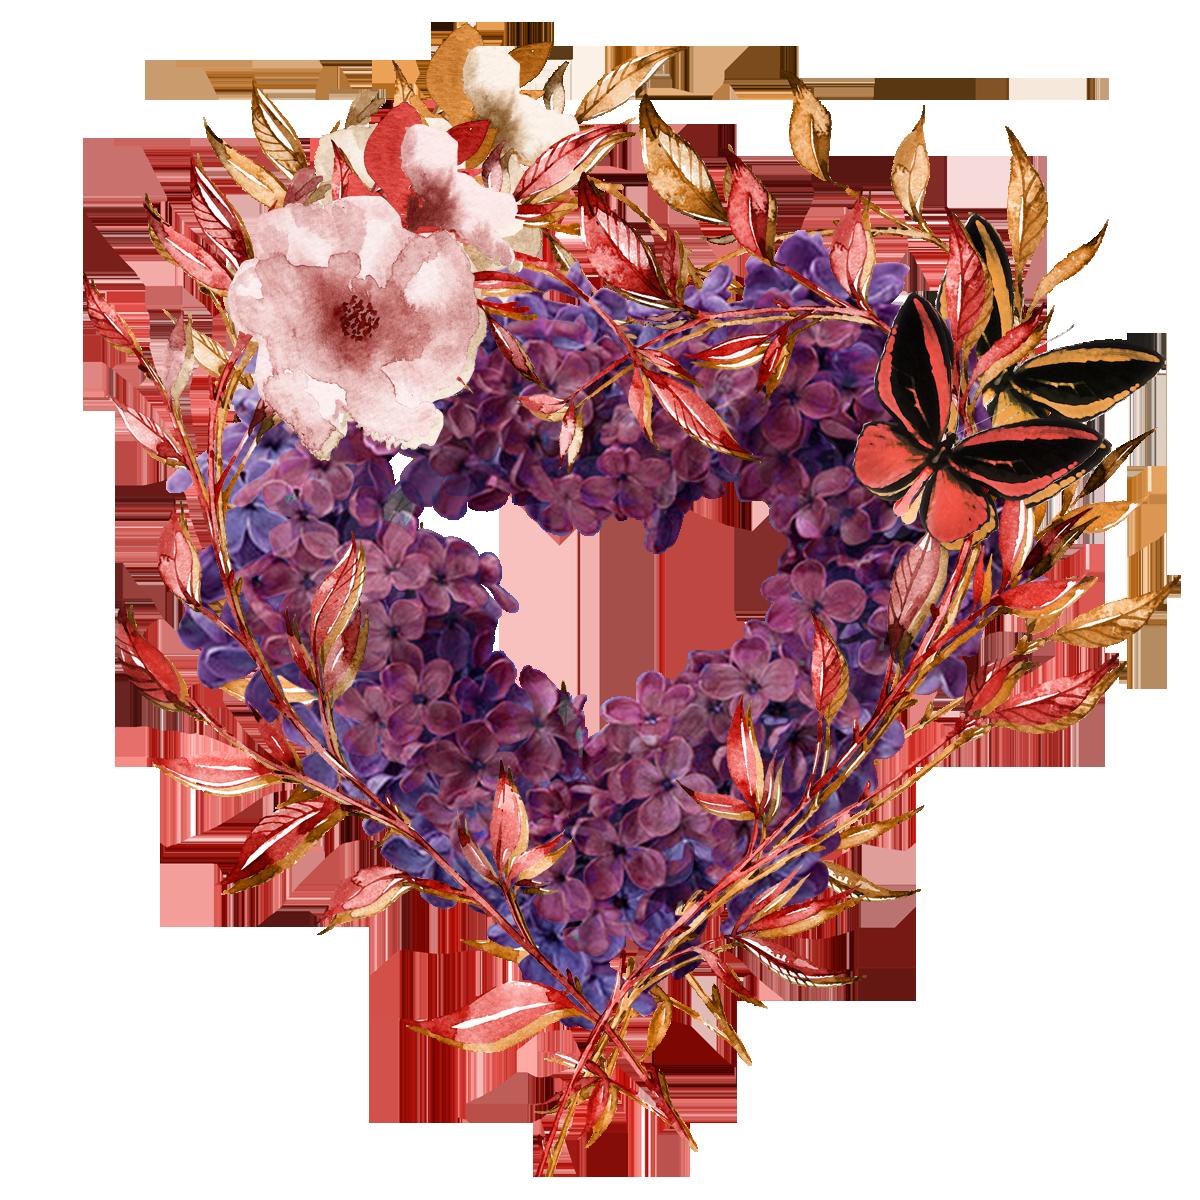 corazon flores mezcla rojo